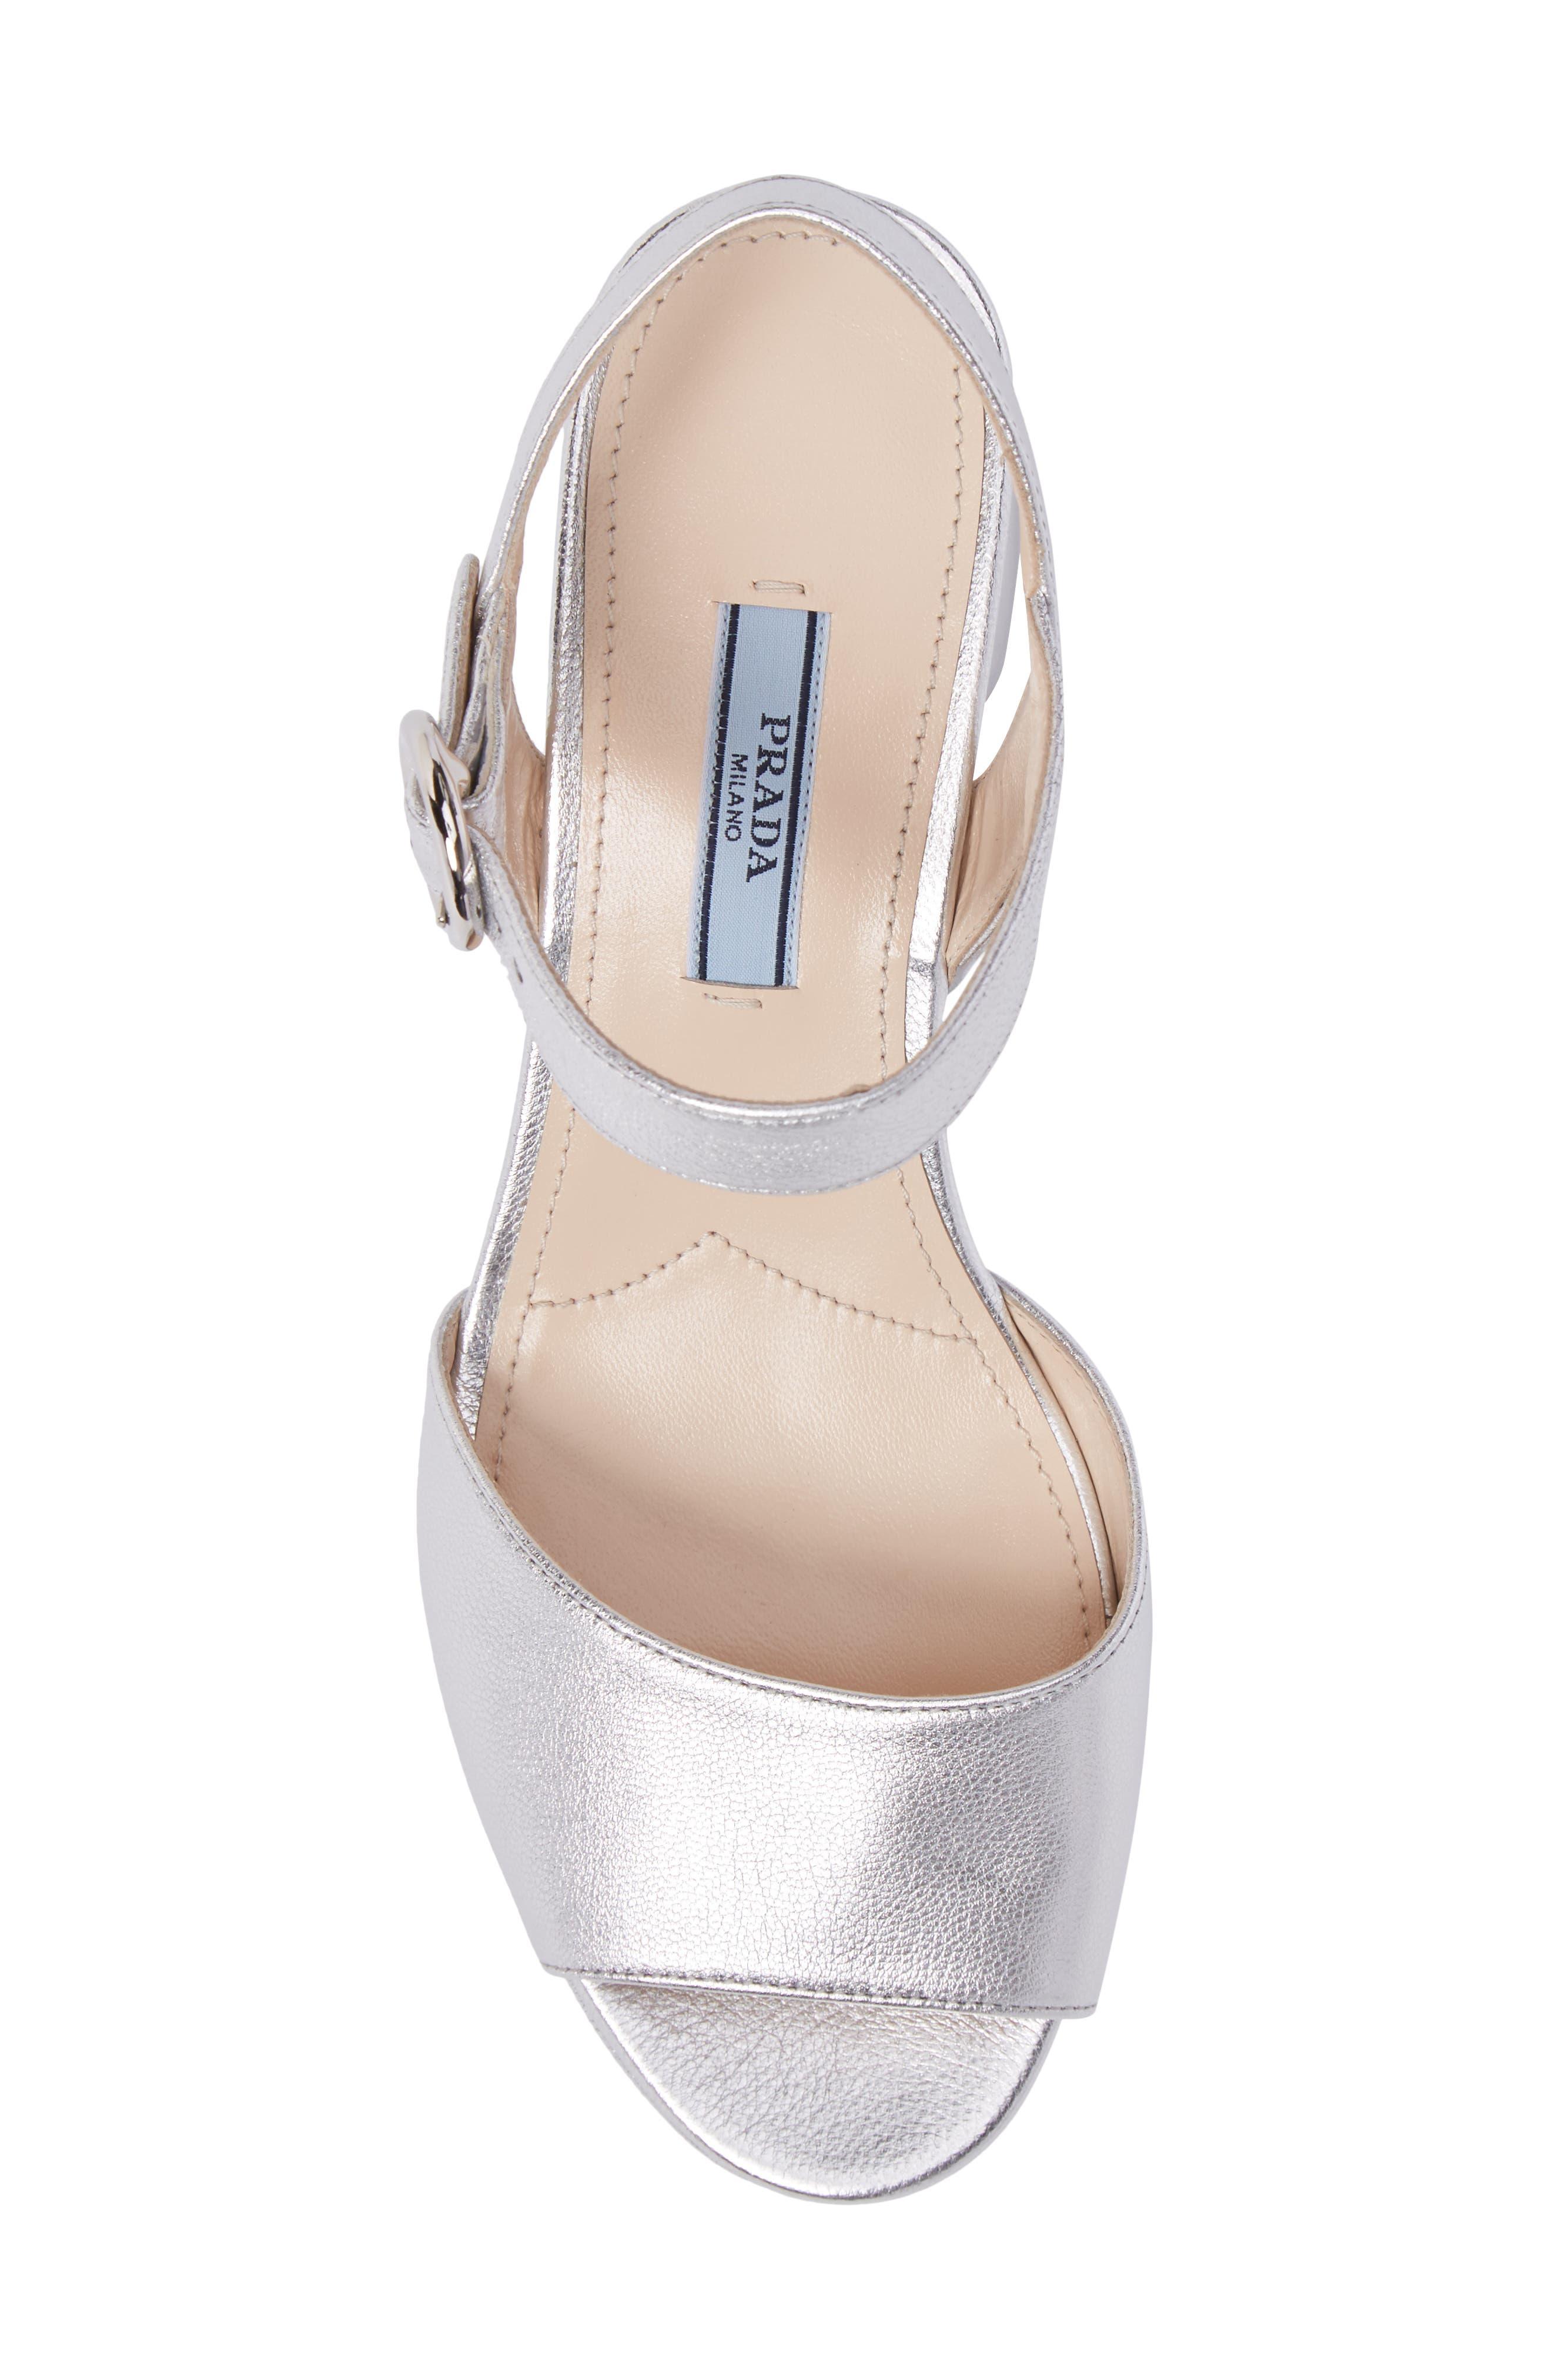 Ankle Strap Platform Sandal,                             Alternate thumbnail 5, color,                             Silver